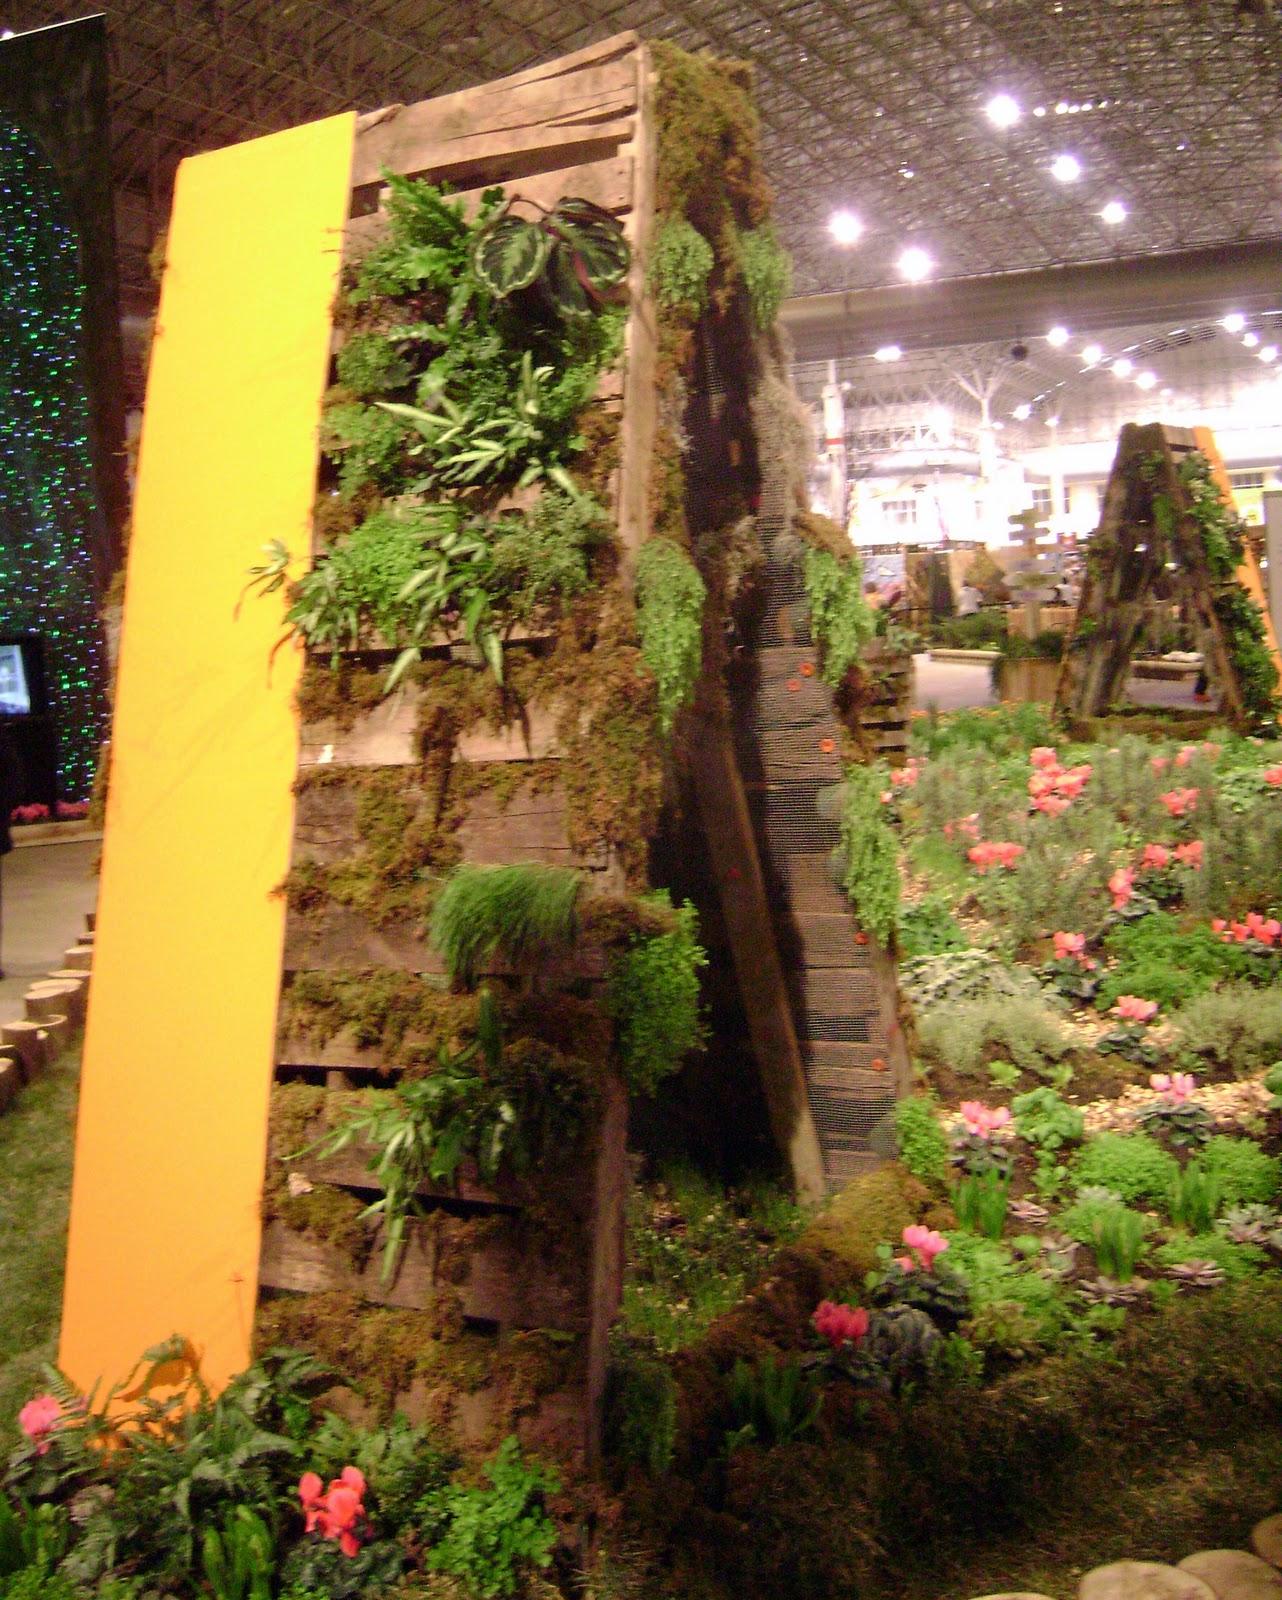 Vertical Garden Chicago: Prairie Rose's Garden: Spring Fever Cure--The Chicago